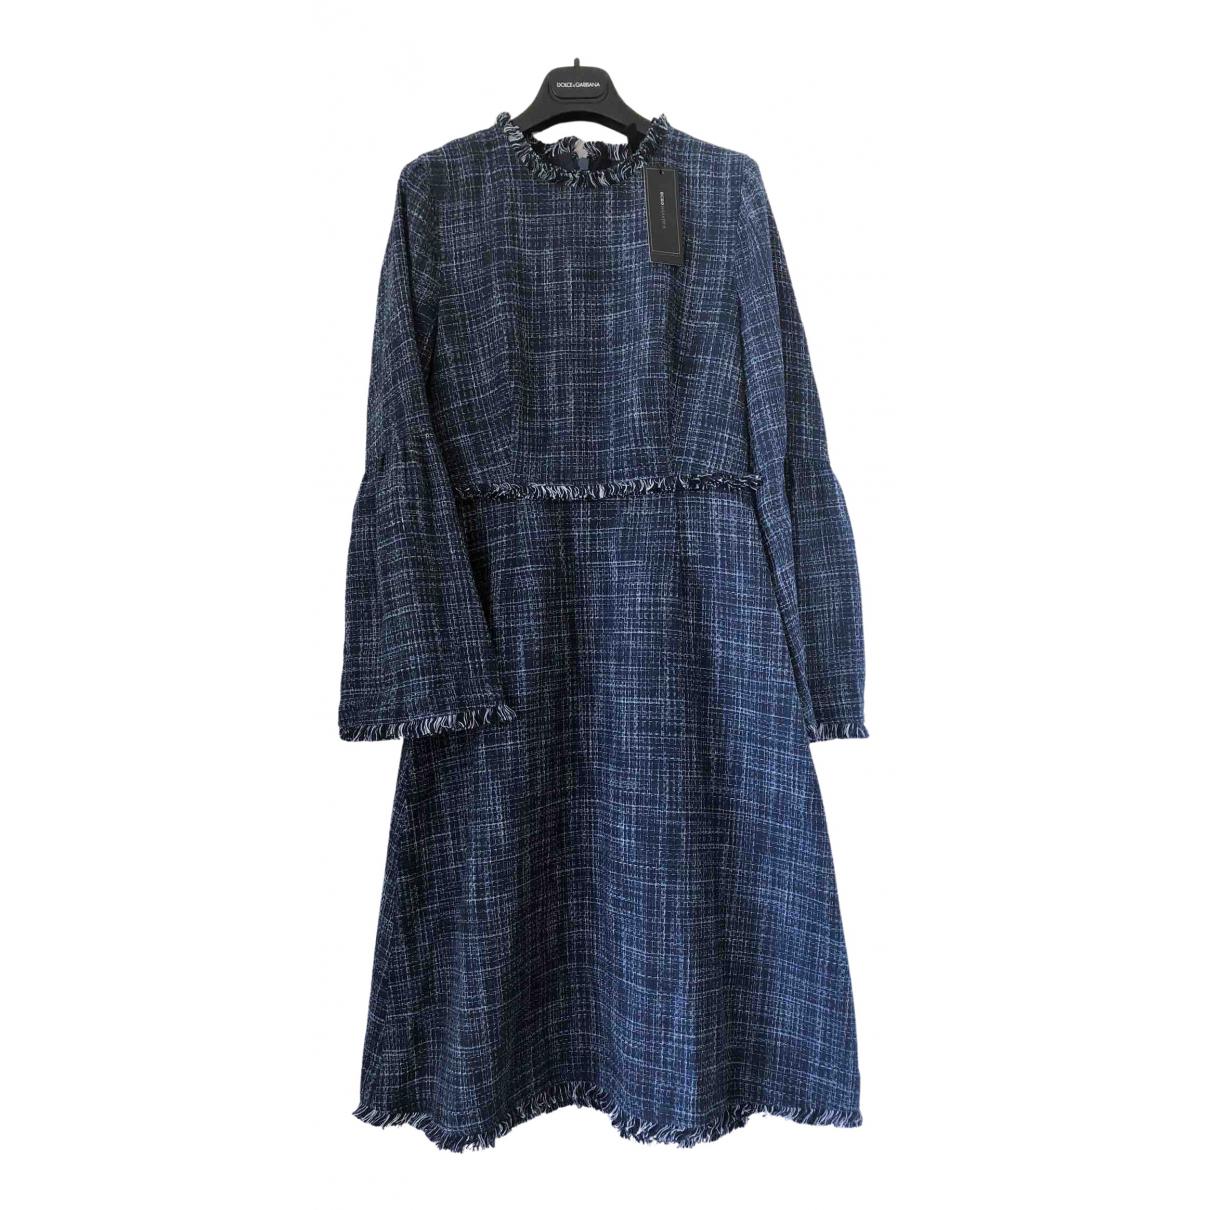 Bcbg Max Azria - Robe   pour femme en coton - marine